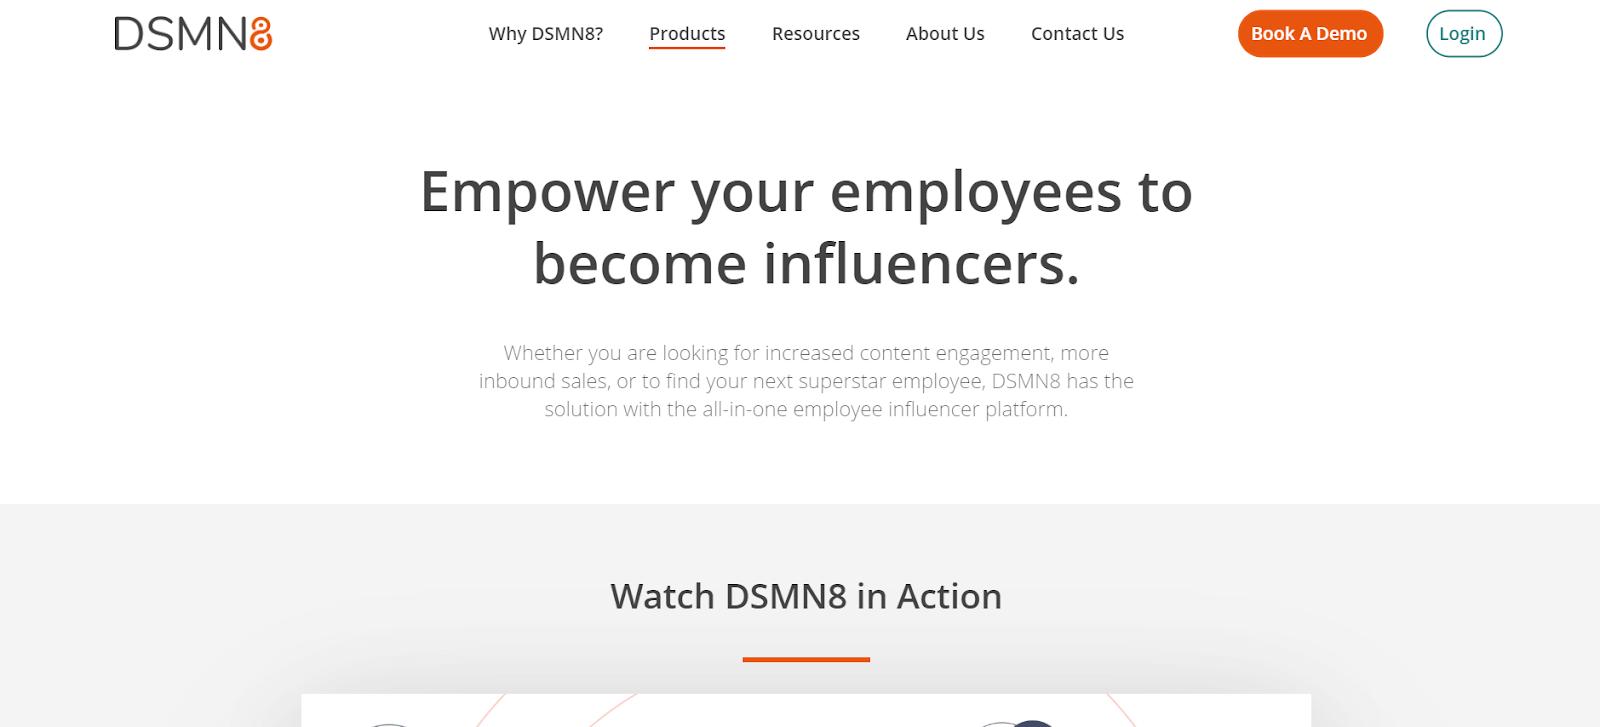 DSMN8 Employee Advocacy Tools